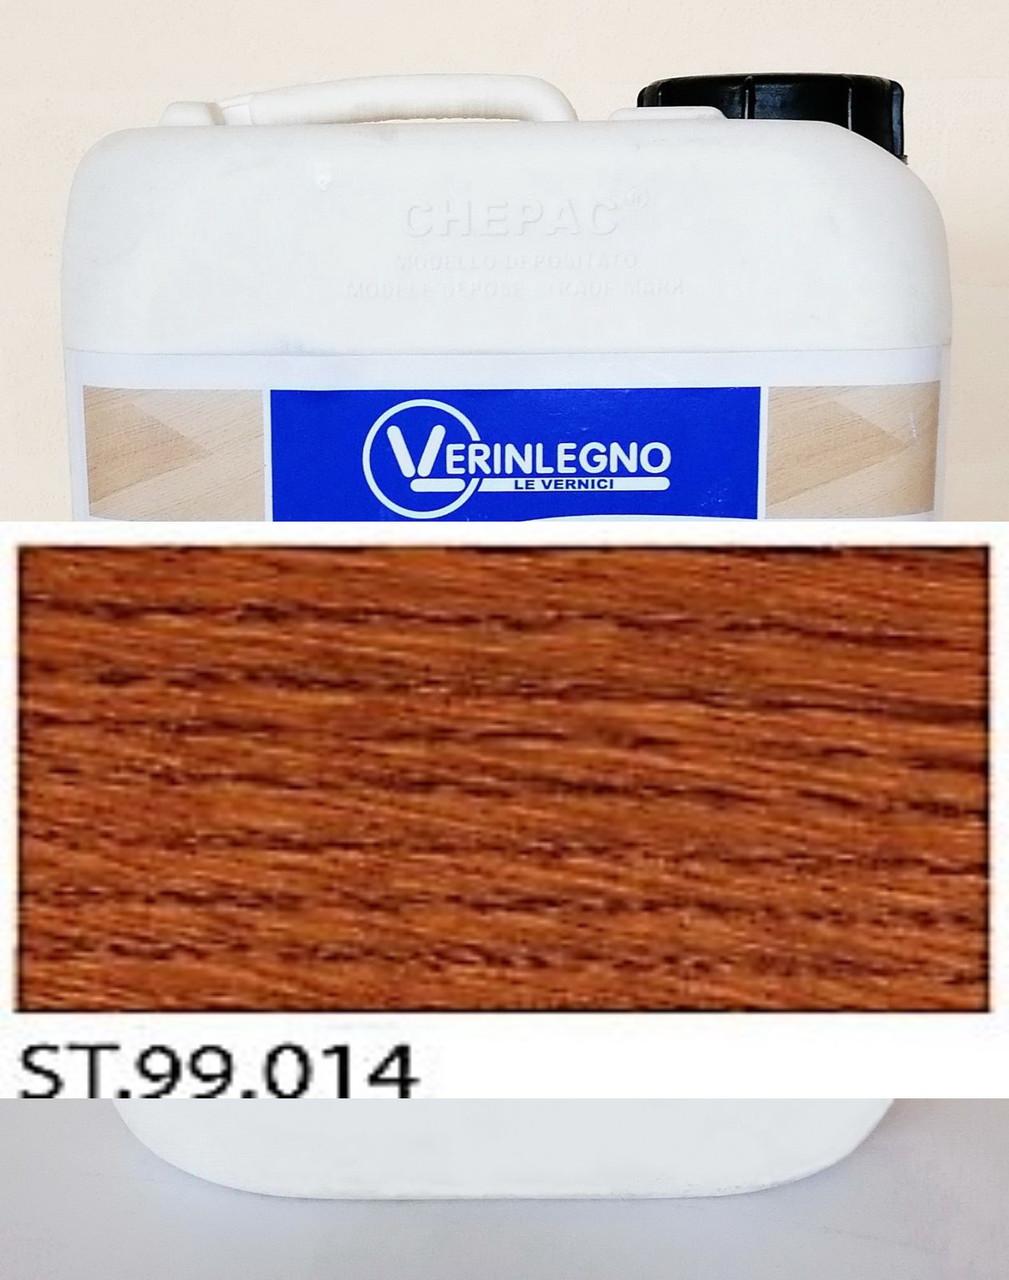 Краситель (морилка, пропитка, бейц)  для дерева VERINLEGNO ST.99.014, тара: 1л.